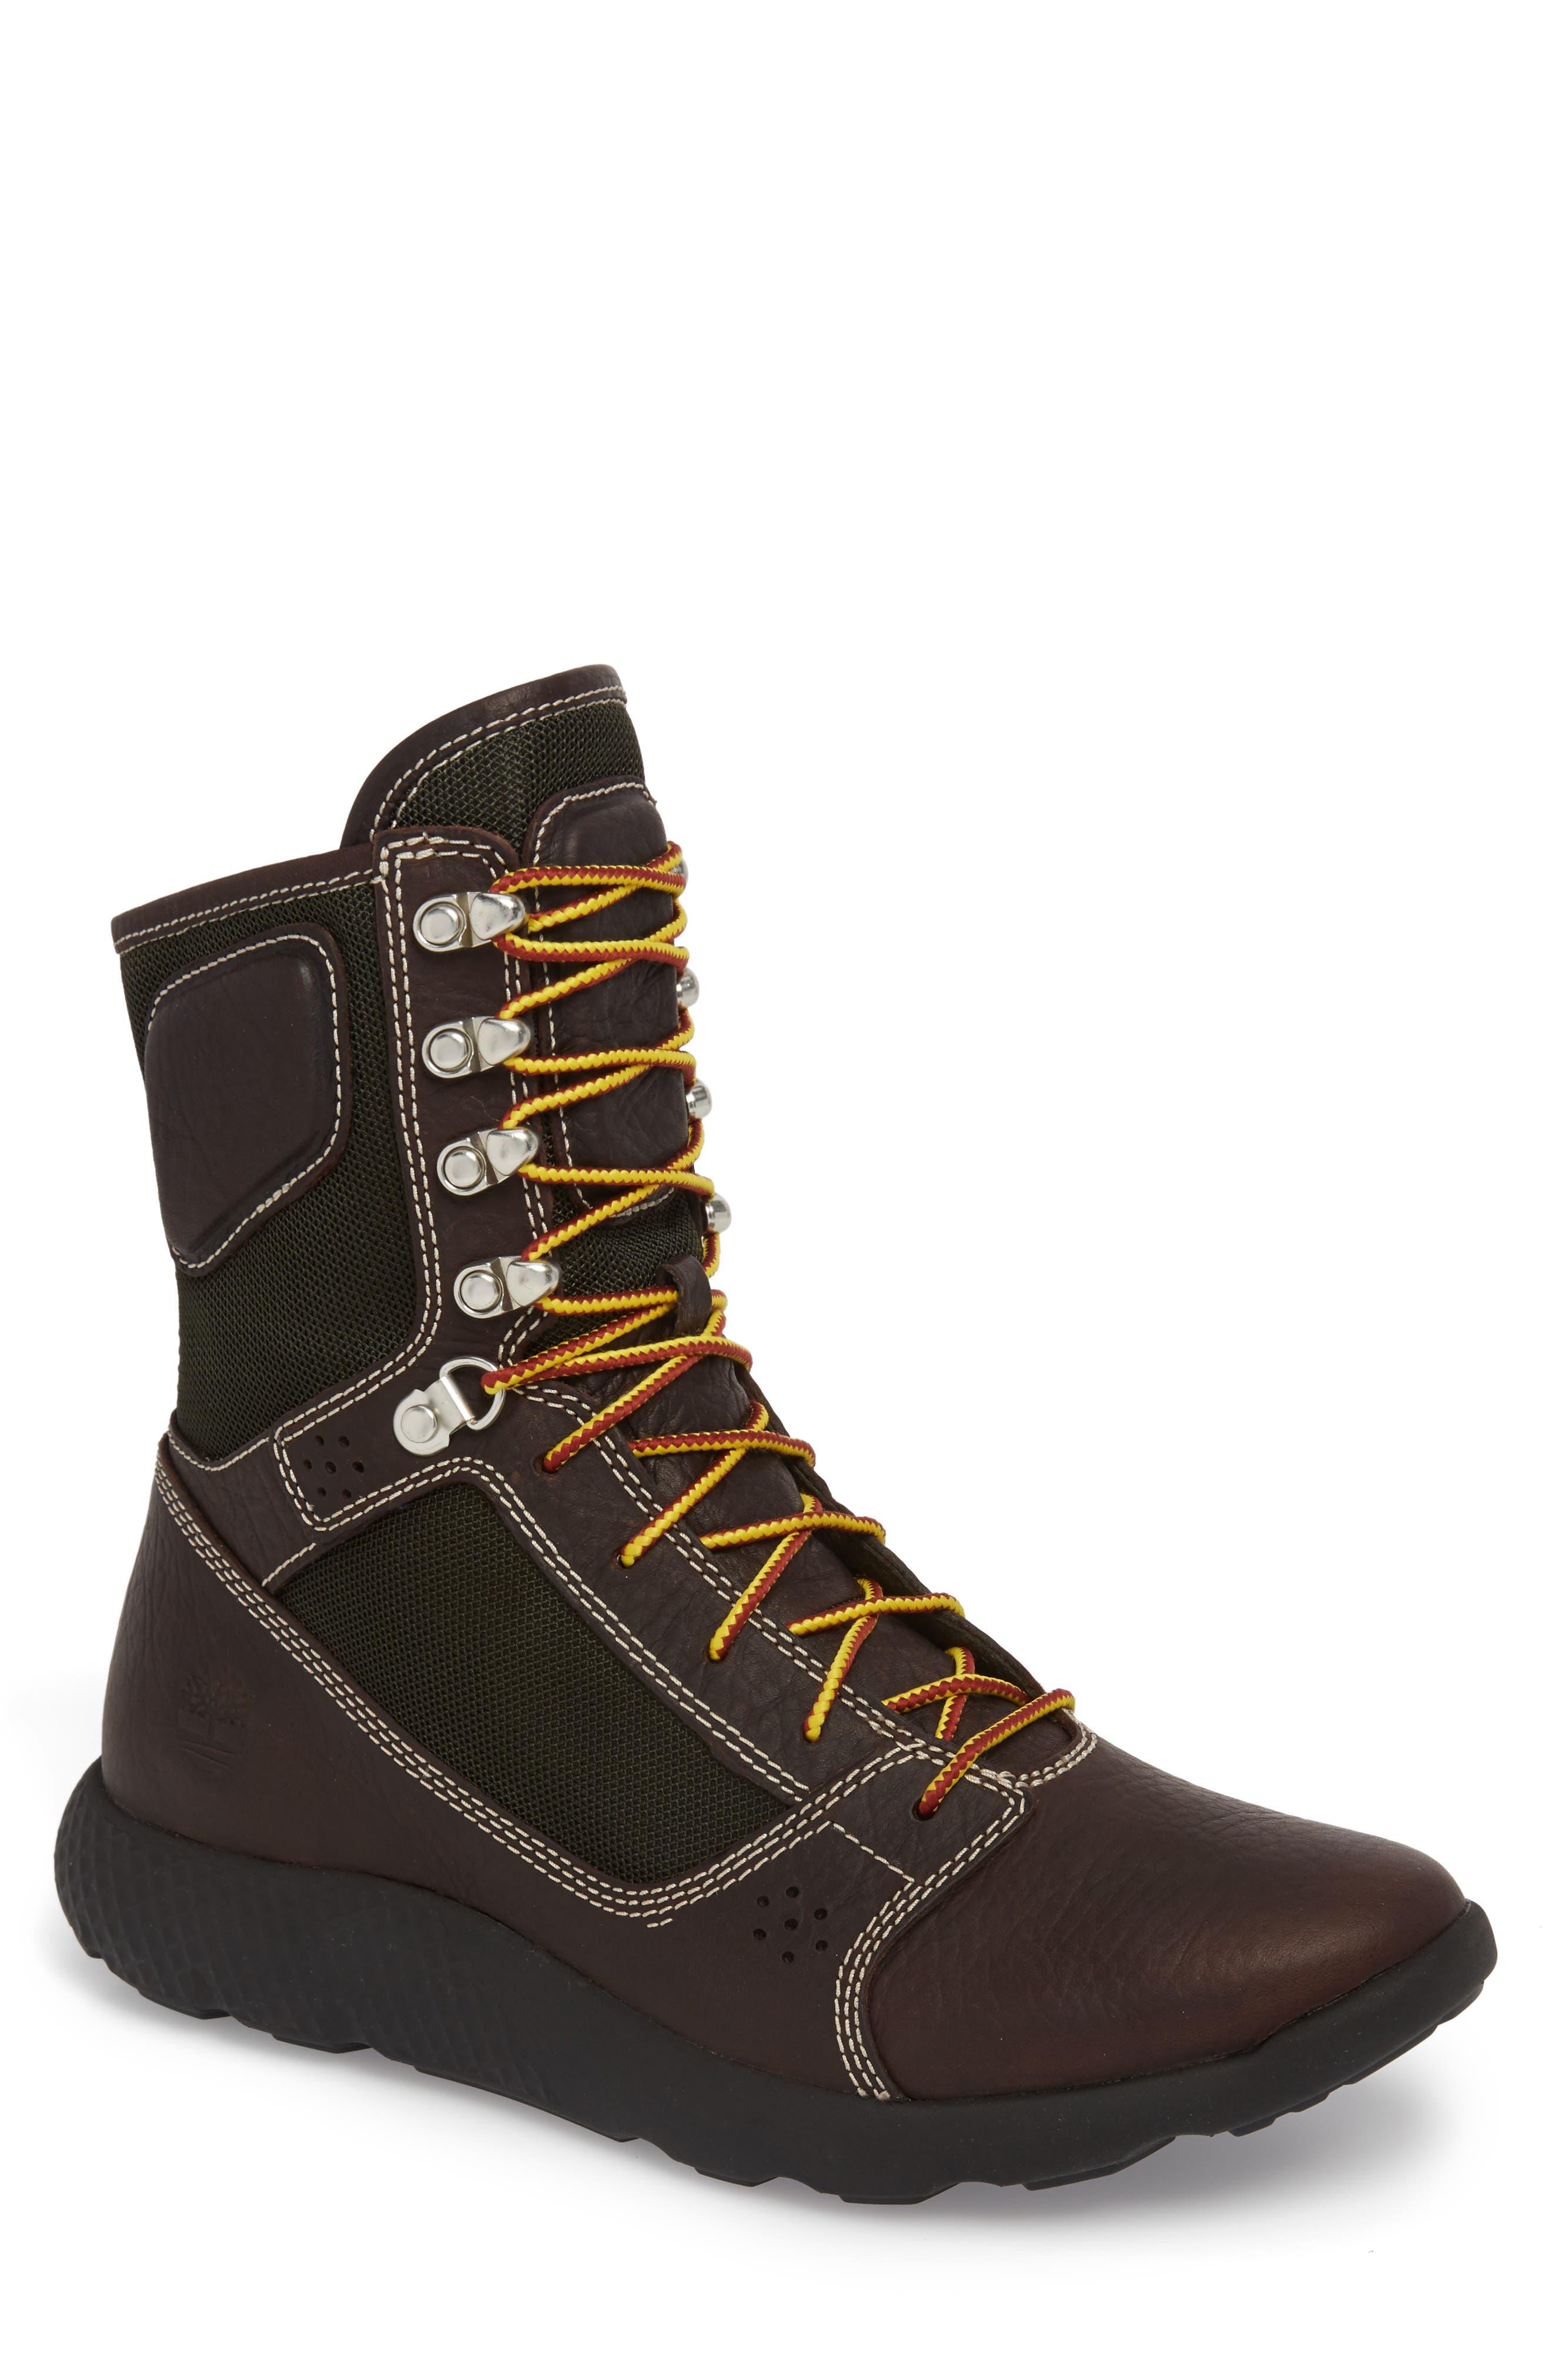 FlyRoam Tactical Boot,                         Main,                         color, 201